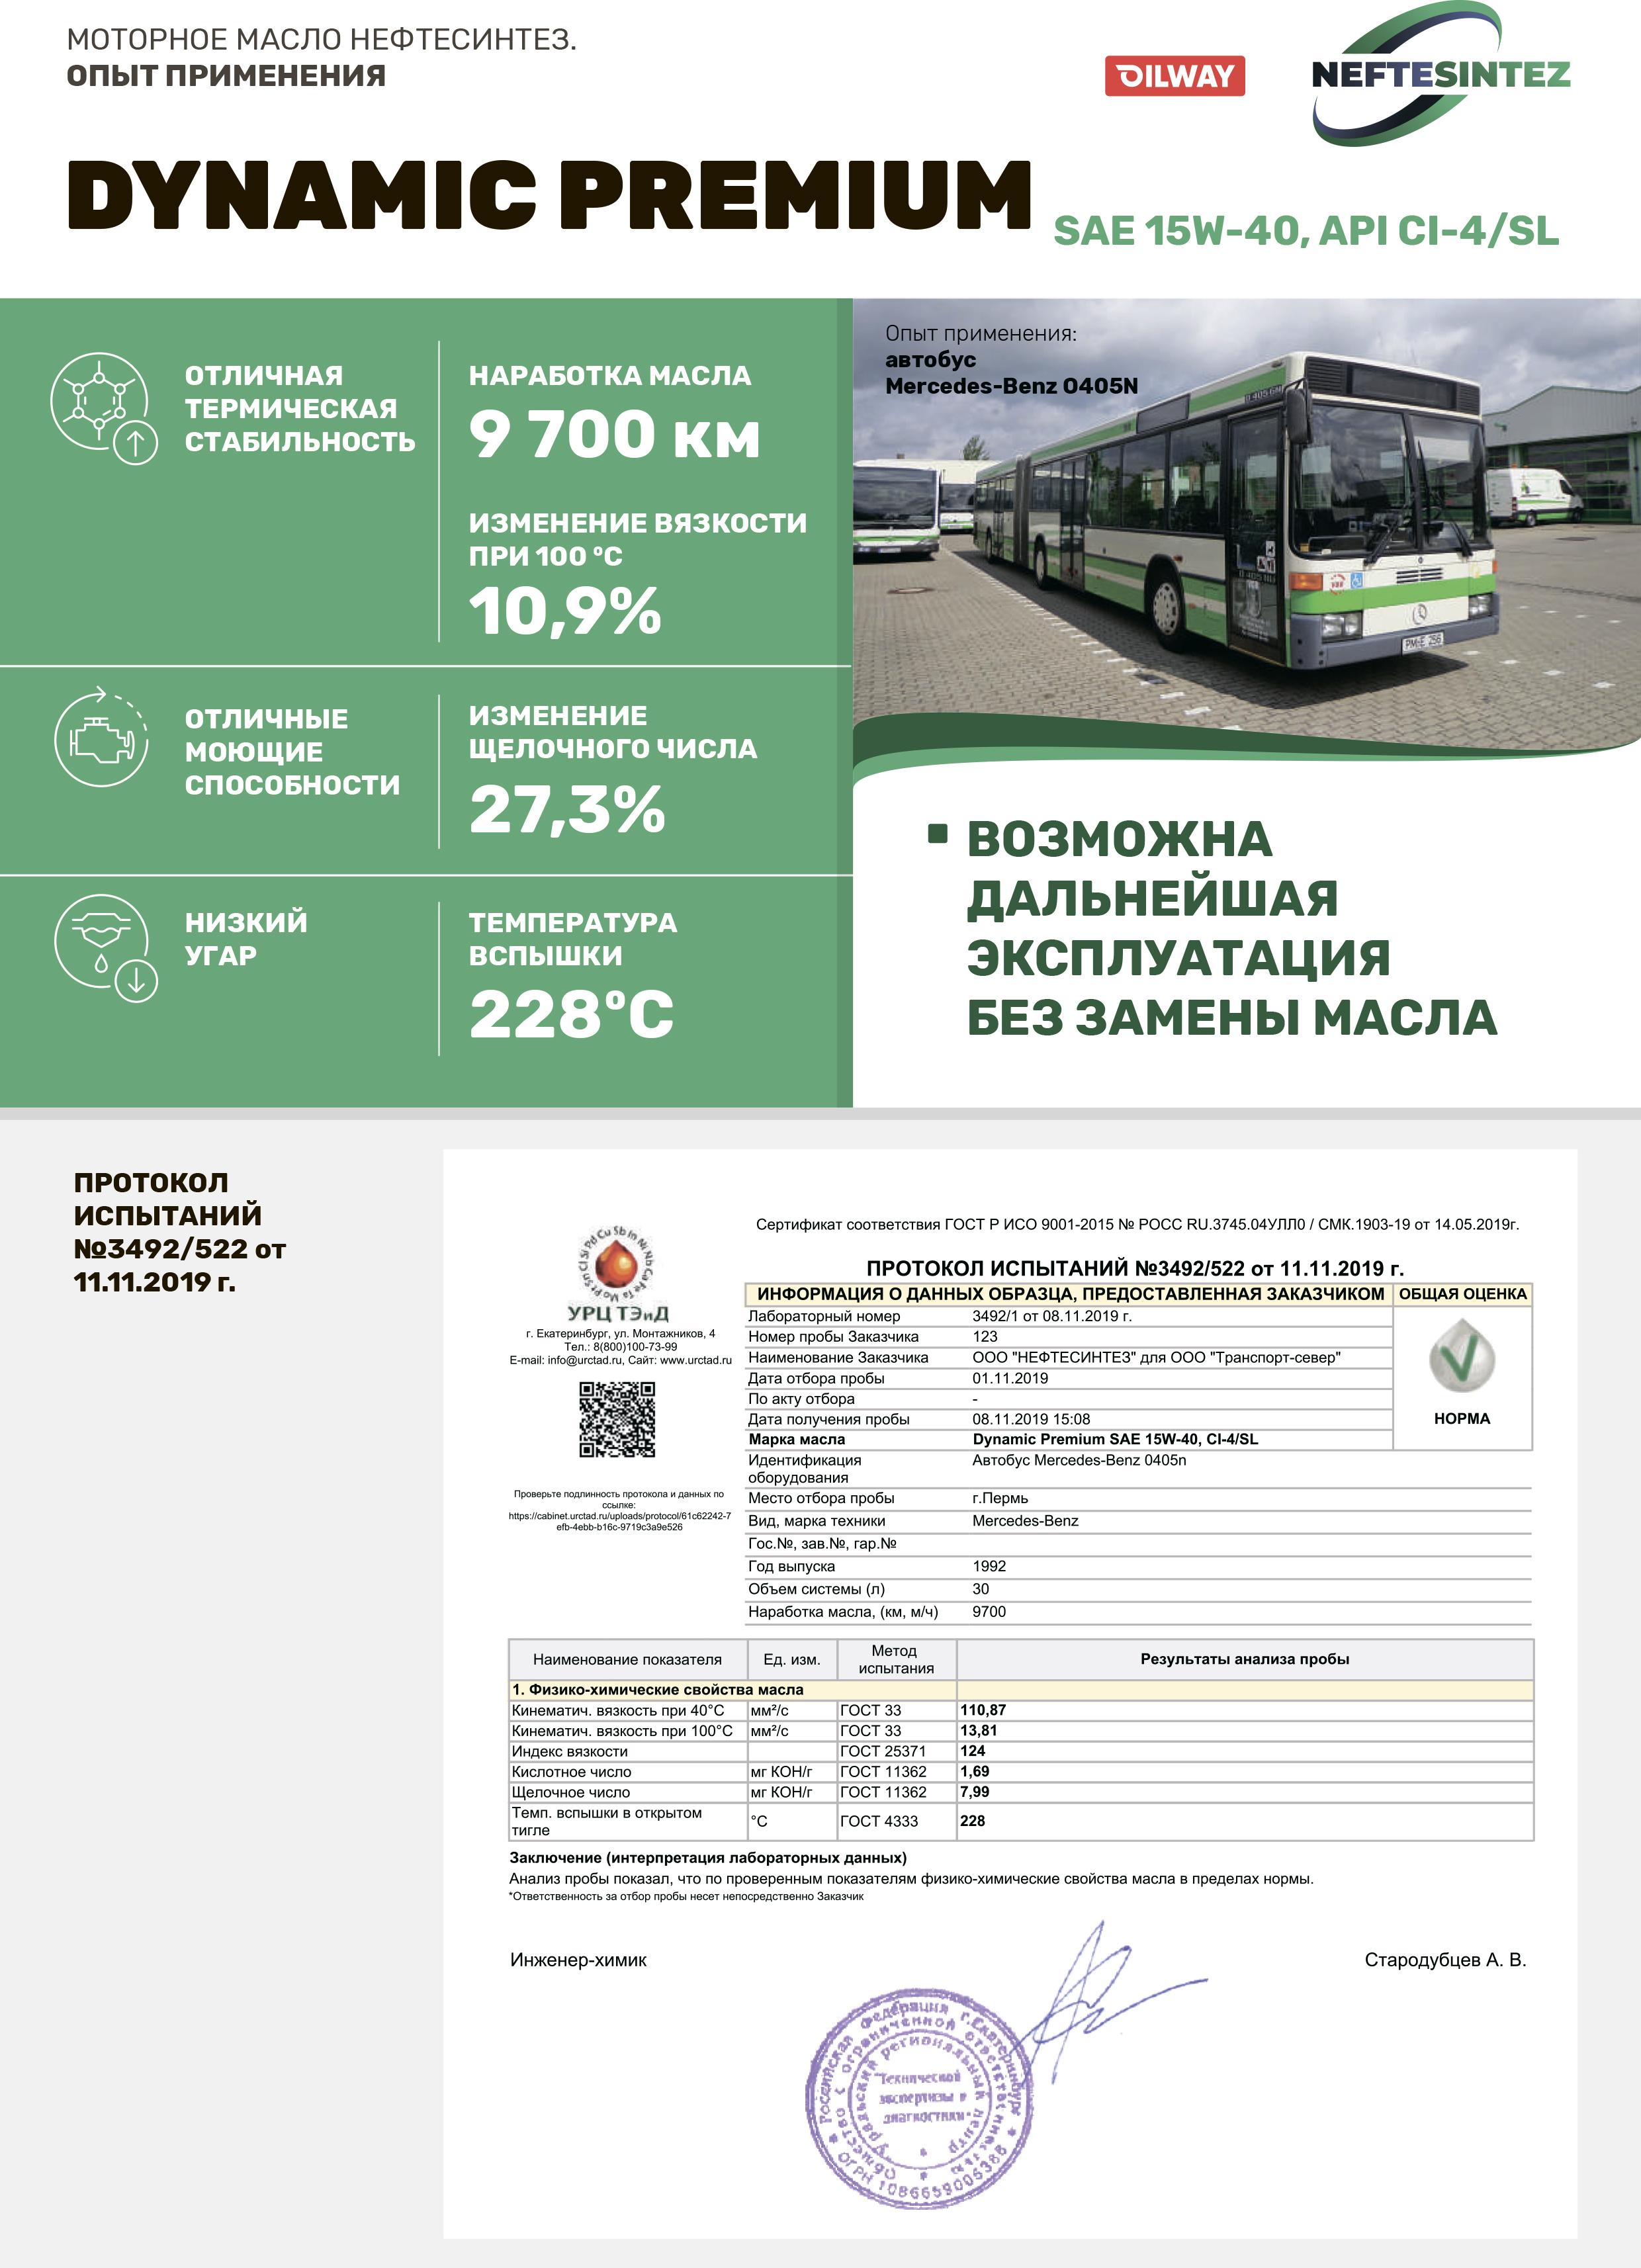 Dynamic Premium 15W-40 (автобус Mercedes